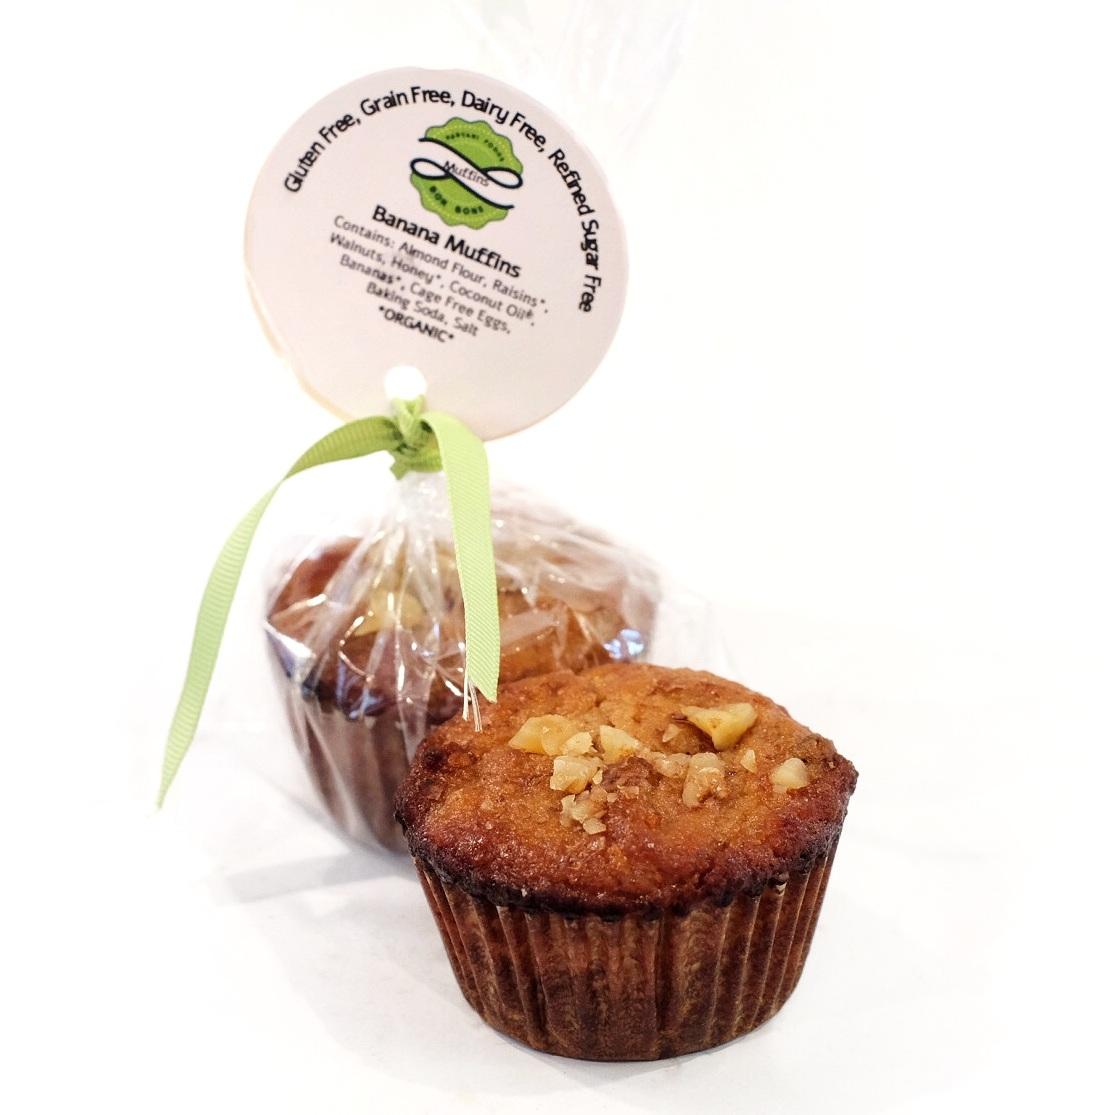 Almond Banana Muffins   Ingredients: Almond Flour, Raisins, Walnuts, Honey, Coconut Oil, Bananas, Cage Free Eggs, Baking Soda, Salt